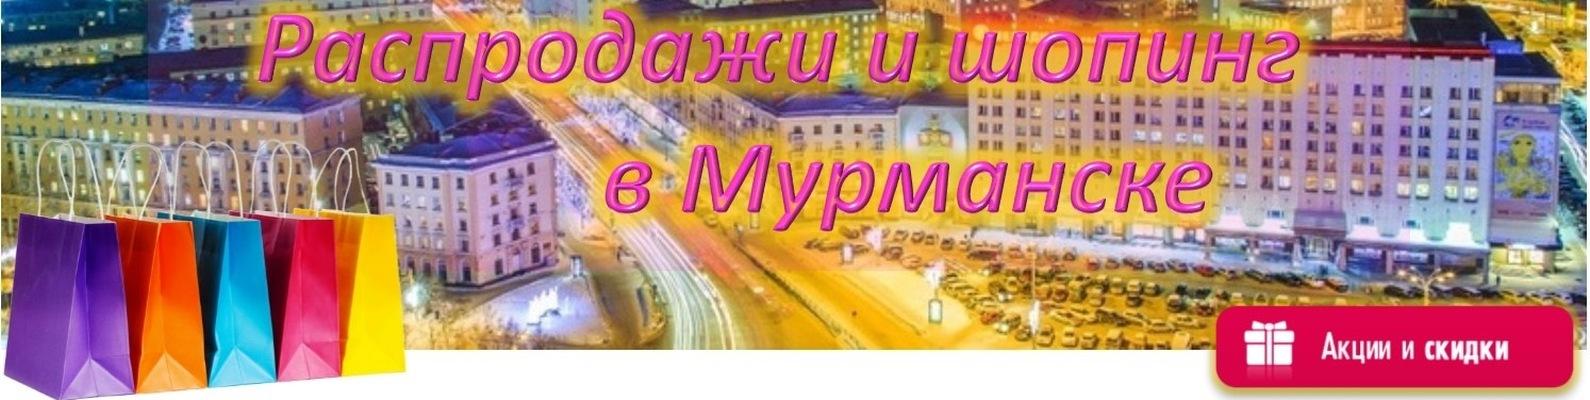 8e37f8d9b5ab ~   Распродажи и шопинг в Мурманске   ~   ВКонтакте